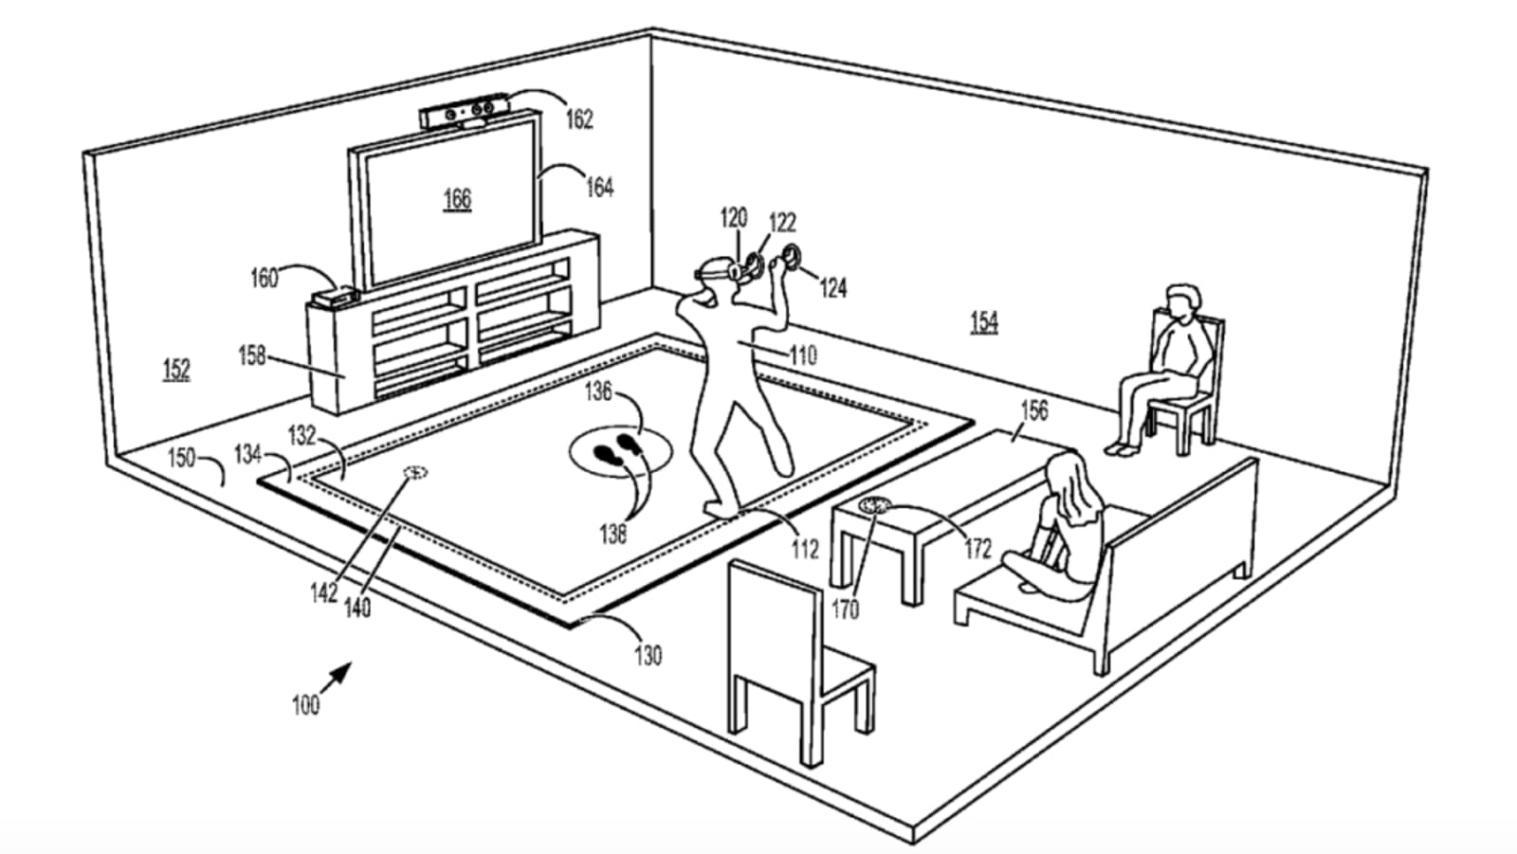 Microsoft Patent Application Describes A Vibrating Floor